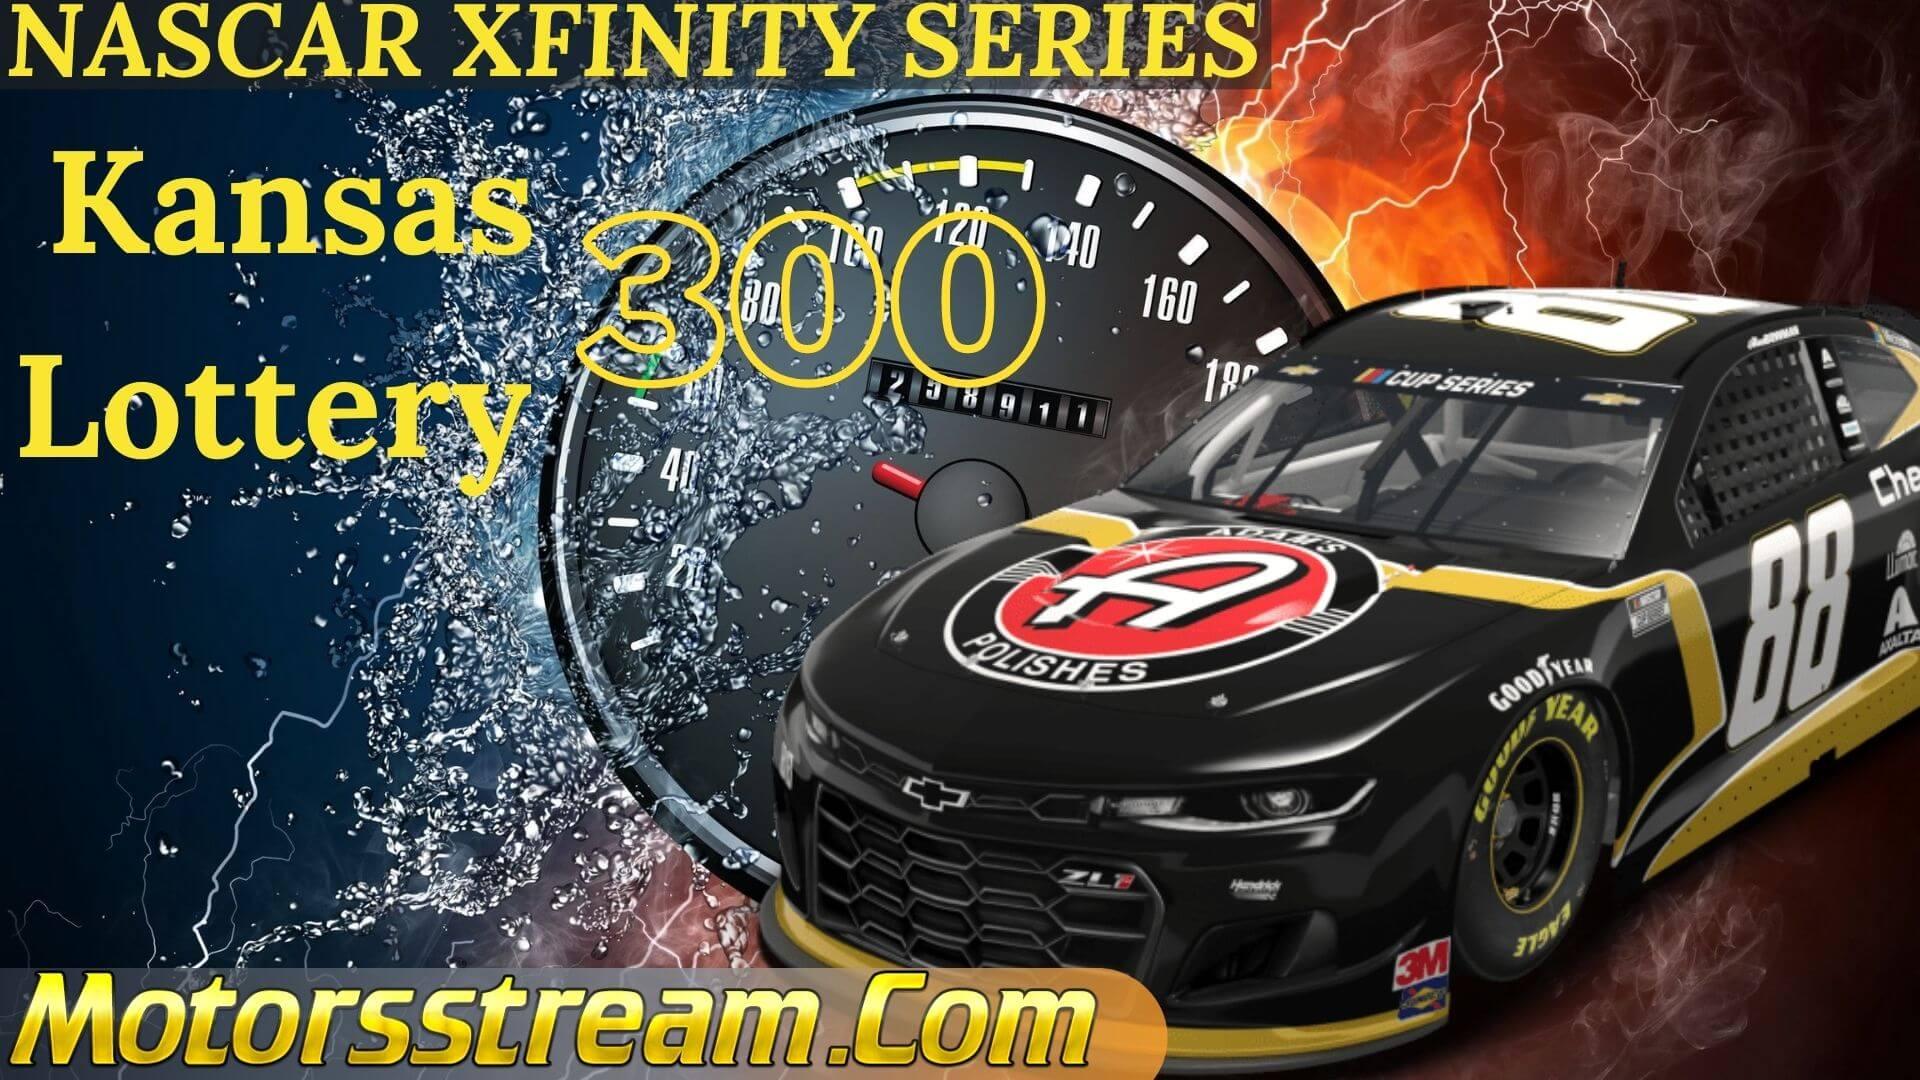 NASCAR Xfinity Kansas 300 Live